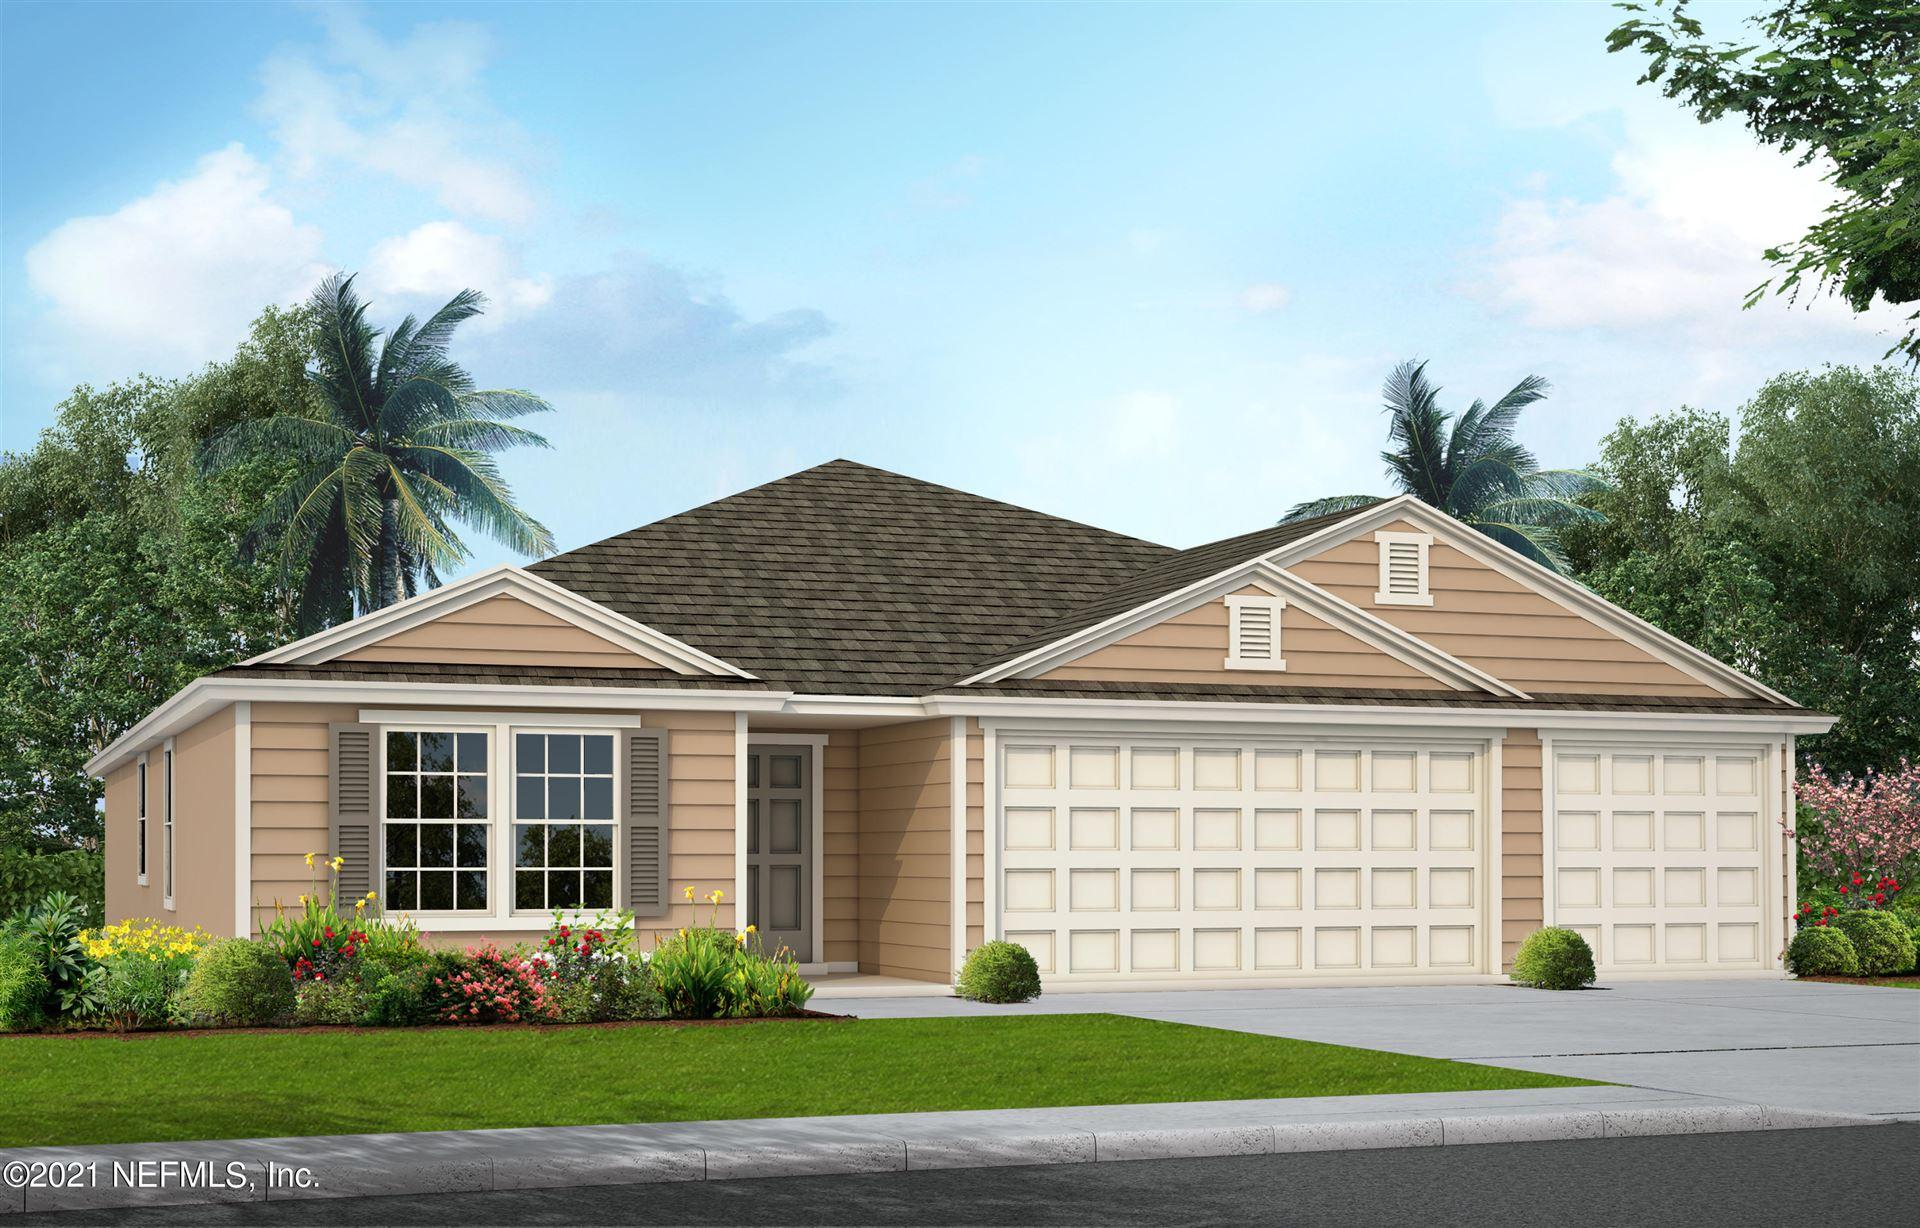 3043 MORNING LAKE CT #Lot No: 396, Green Cove Springs, FL 32043 - MLS#: 1109862